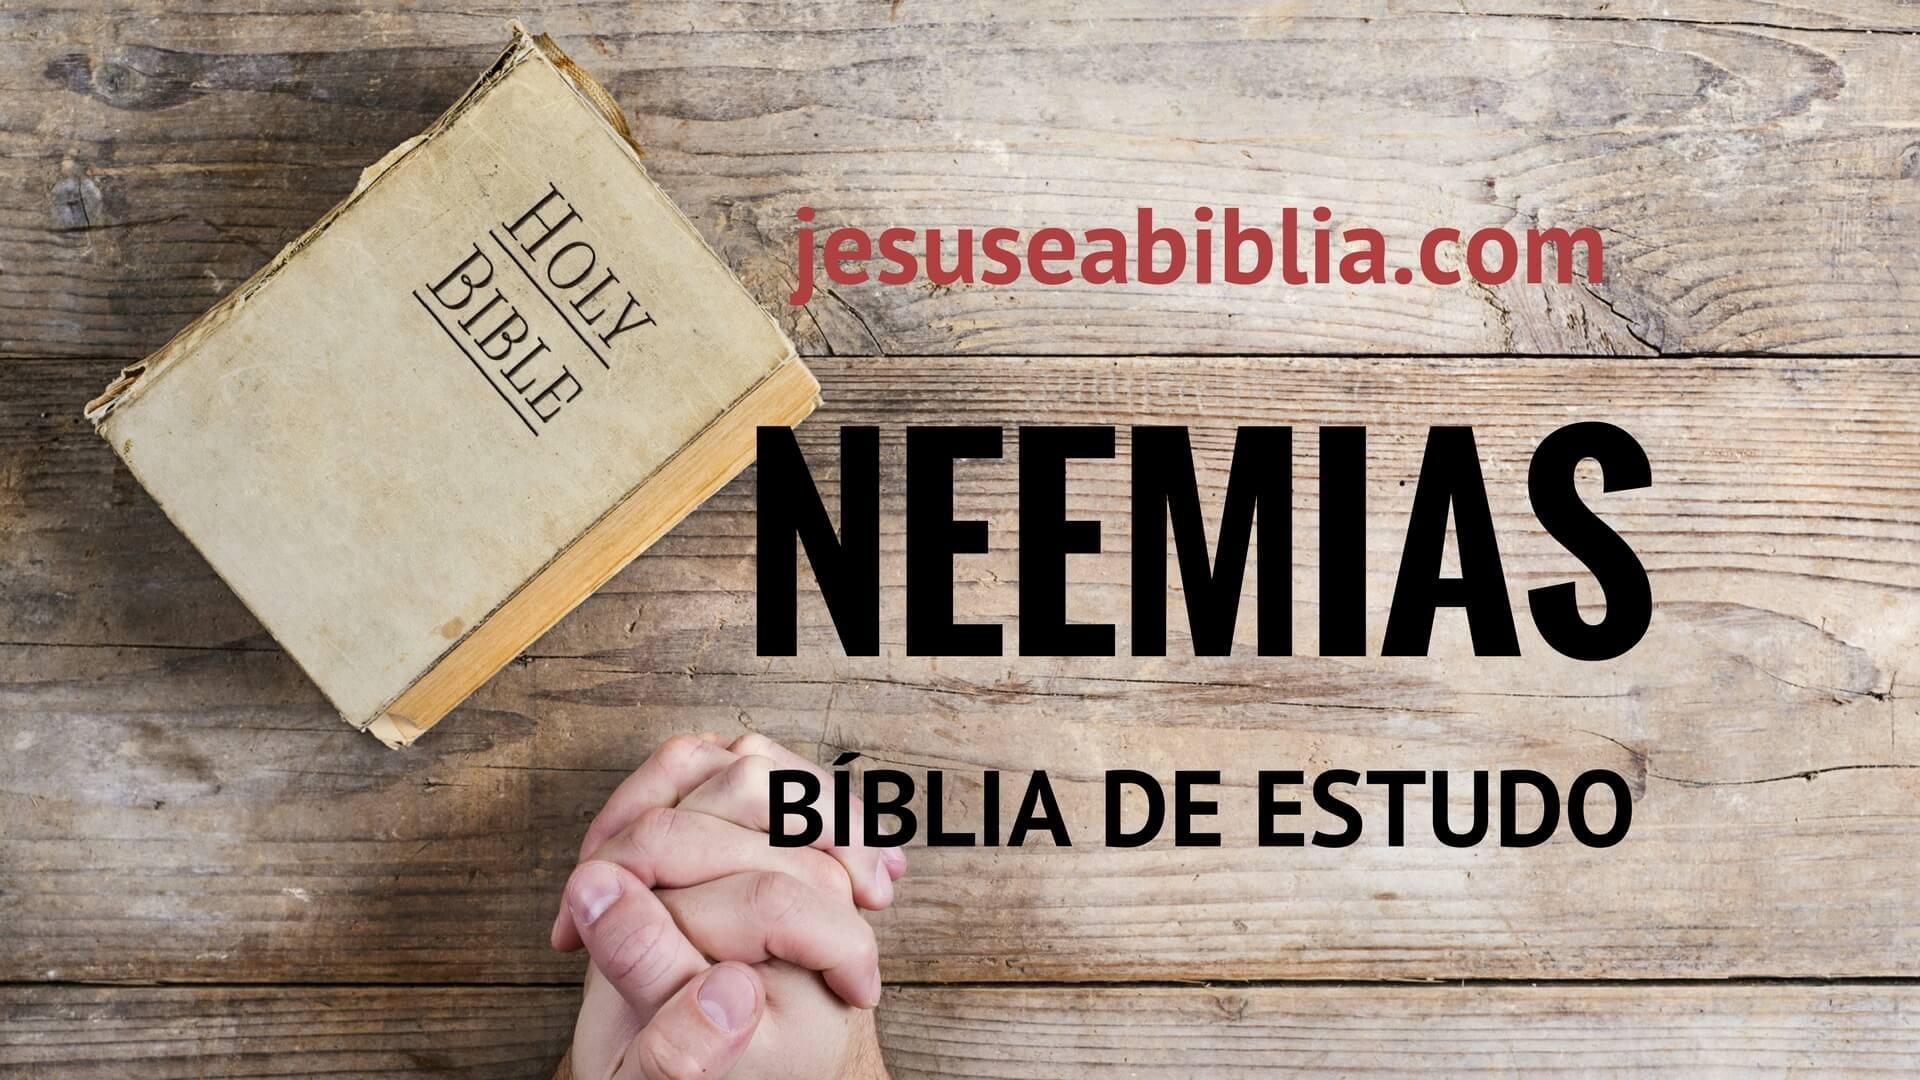 Neemias - Bíblia de Estudo Online